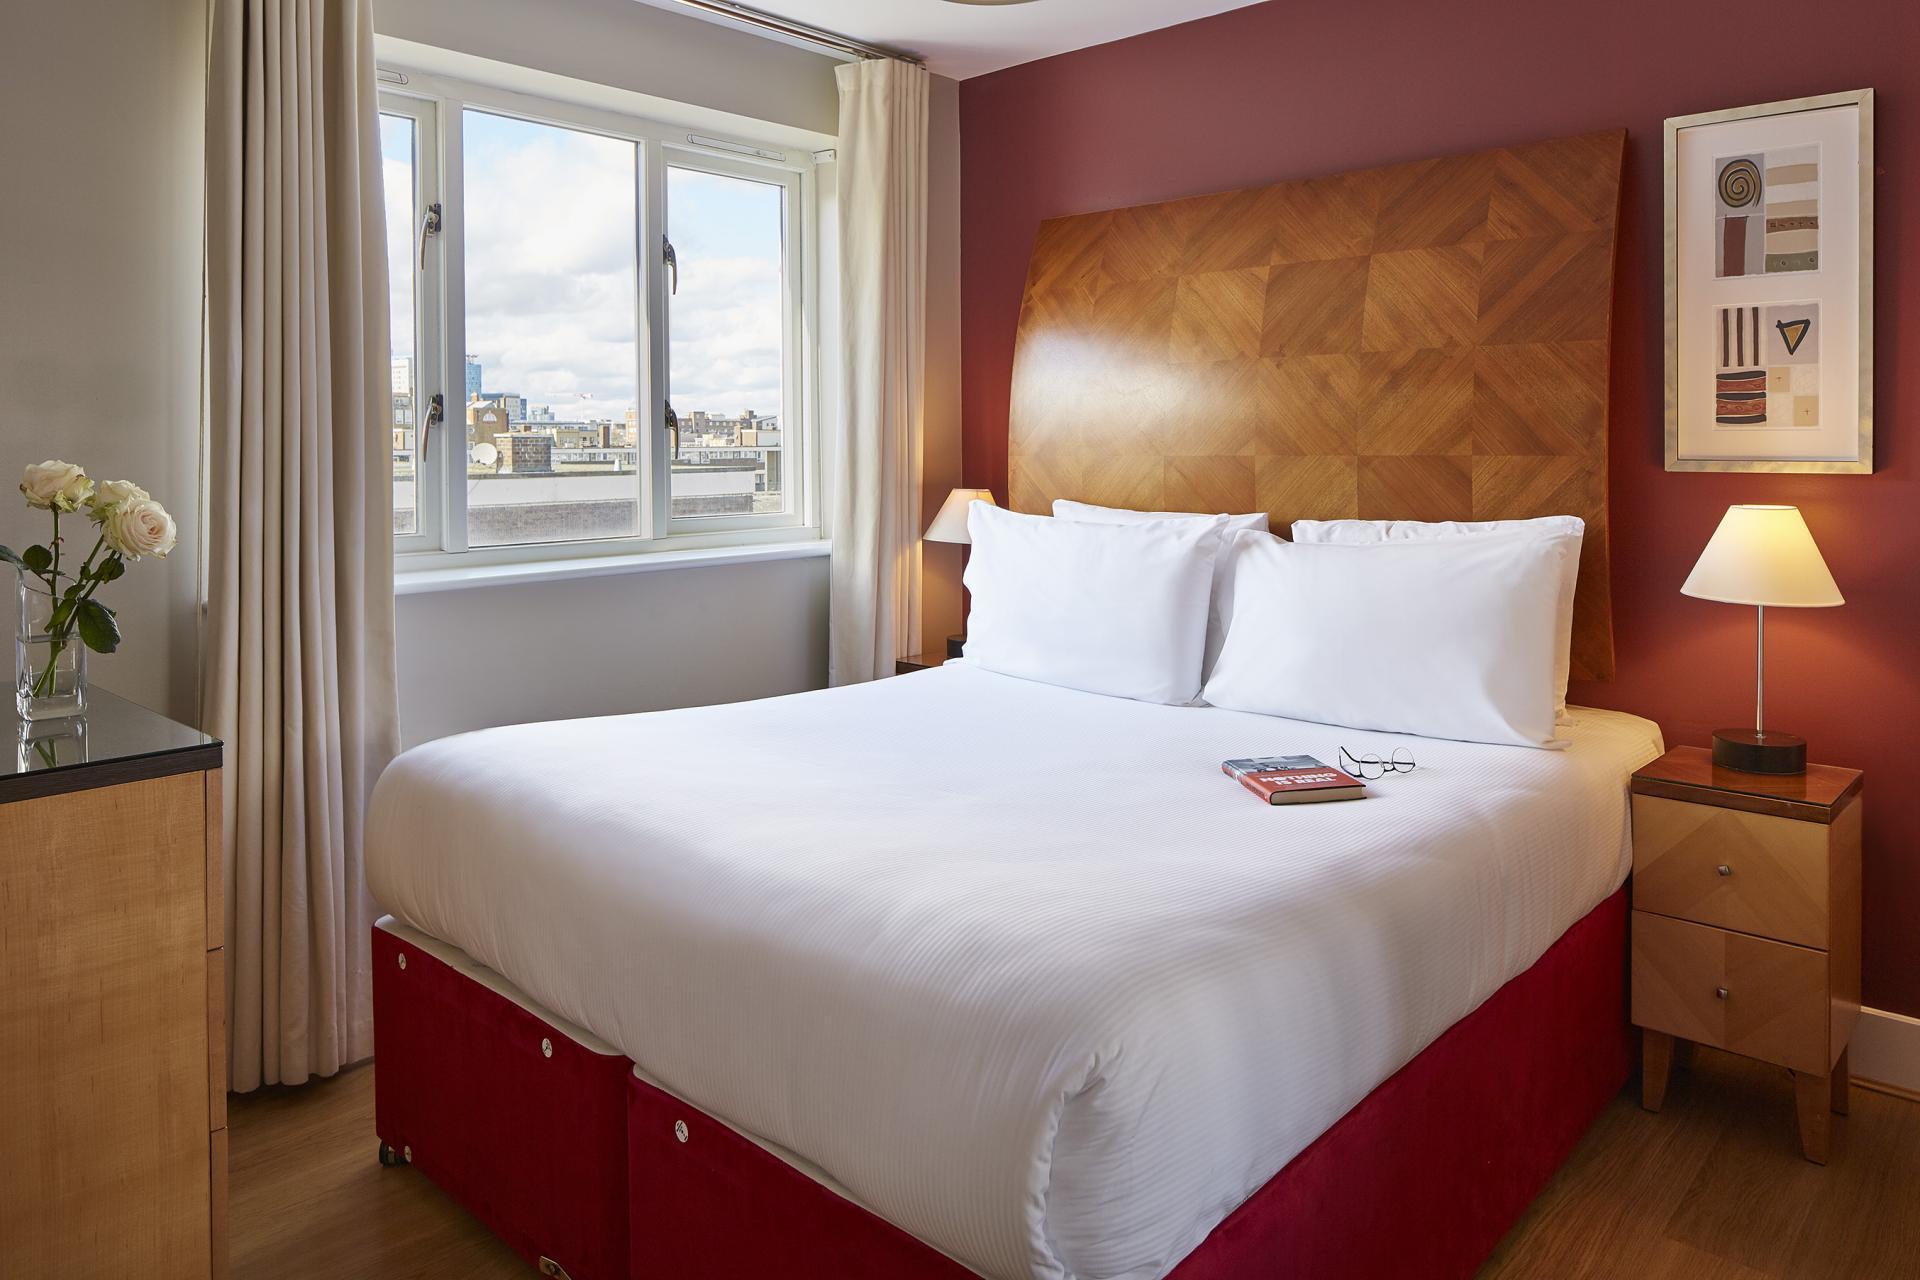 Bedding a Limehouse Apartments, Limehouse, London - Citybase Apartments